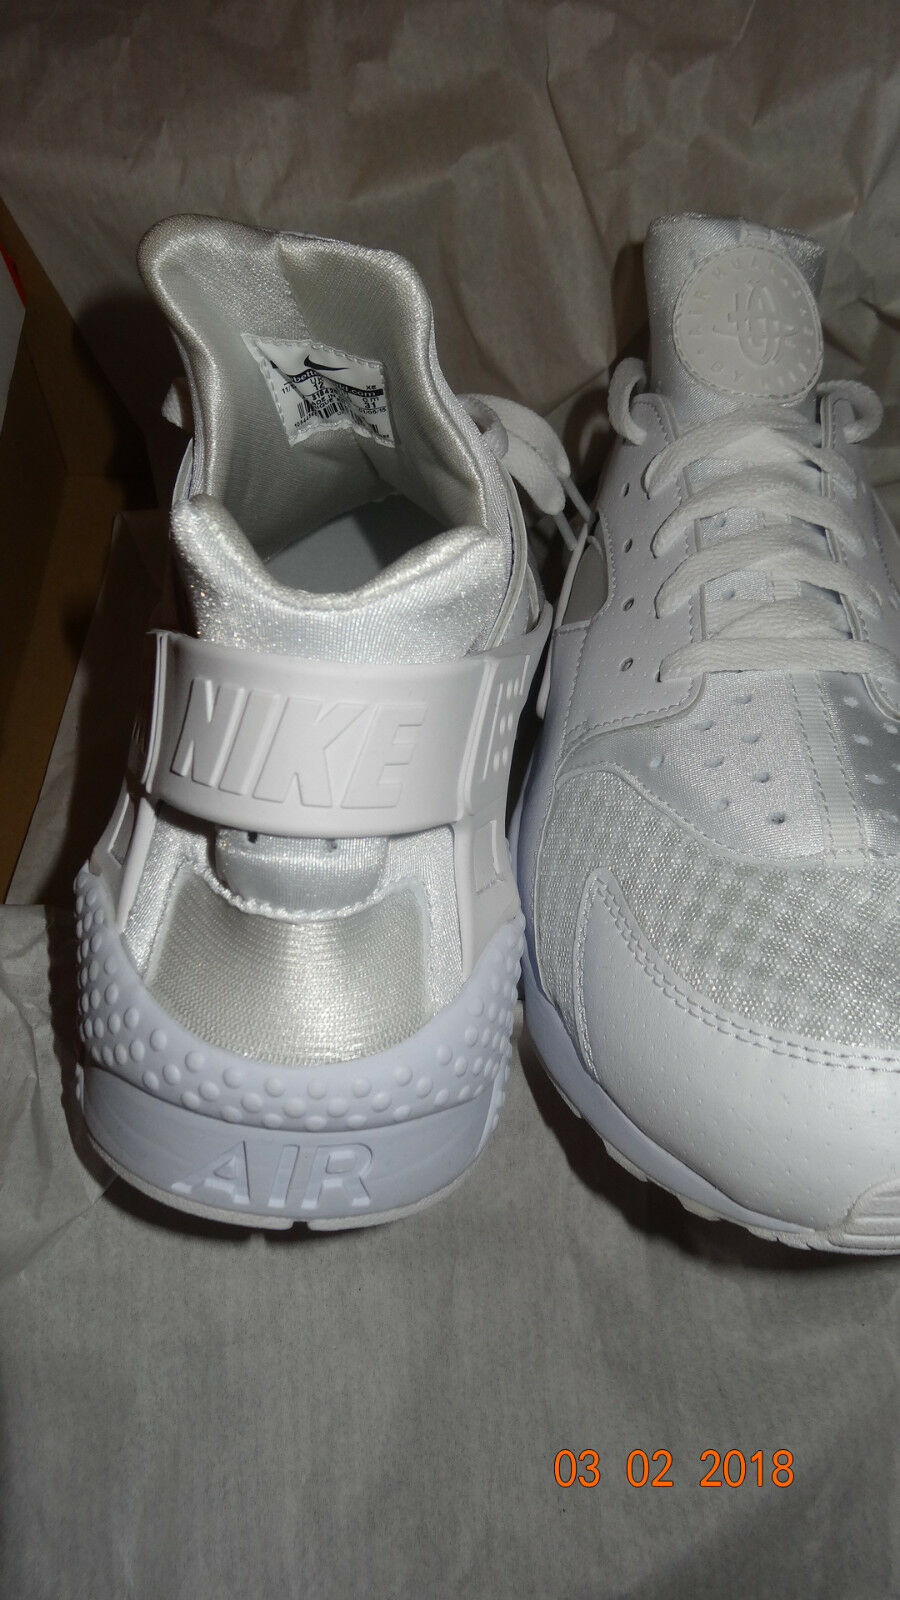 Nike Air Huarache weiß/weiß/platinTriple weiß/weiß/platinTriple weiß/weiß/platinTriple White weiss 47,5 47.5 13 681ac4